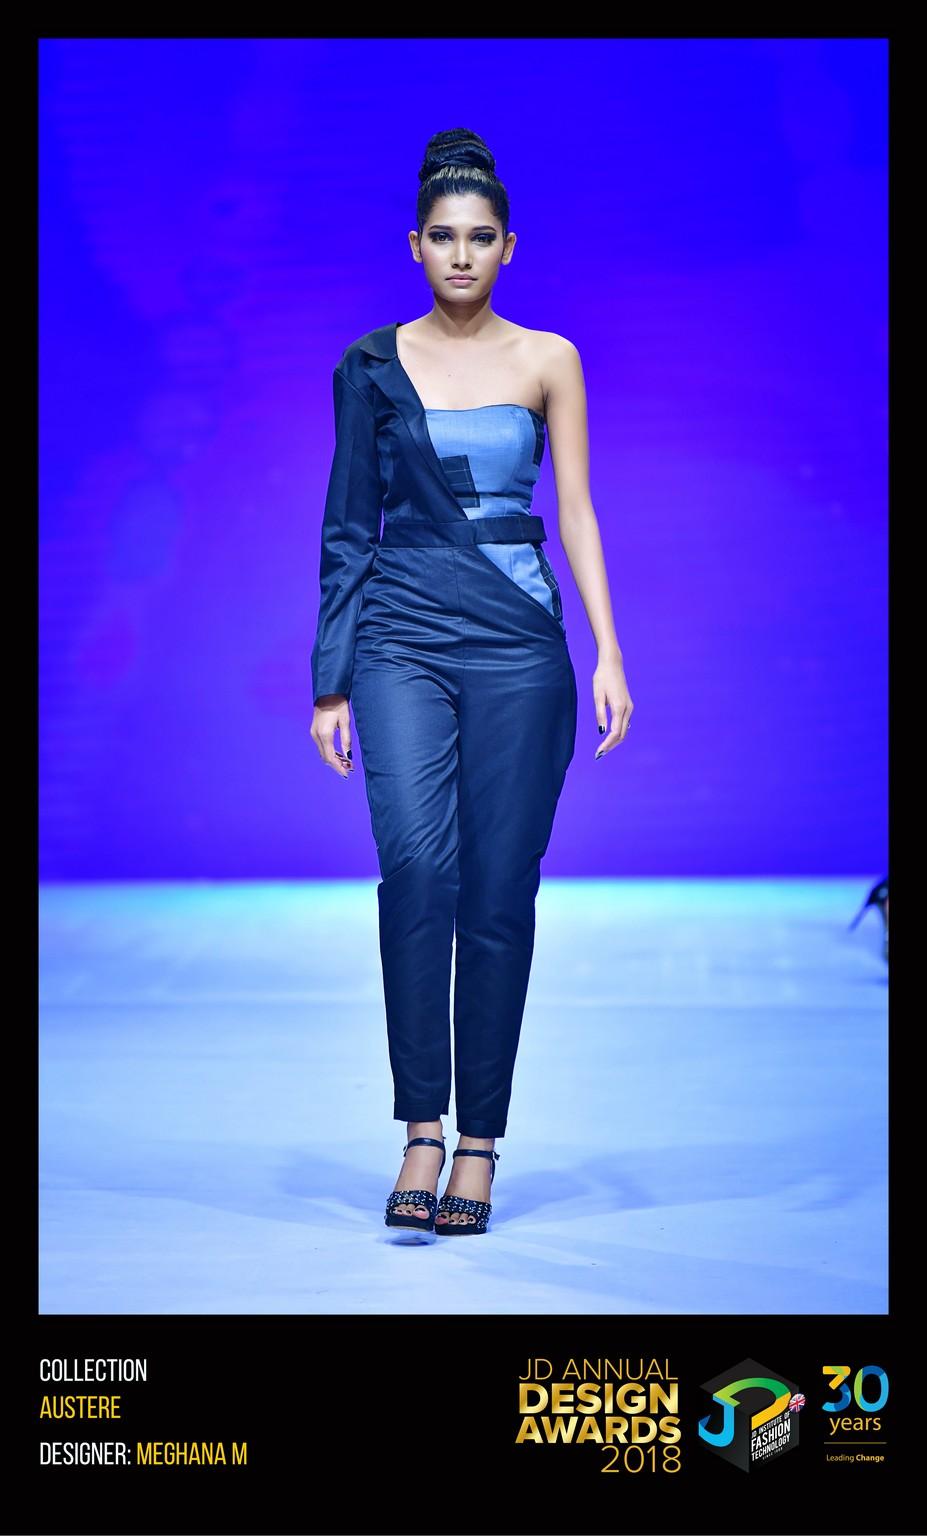 Austere – Change – JD Annual Design Awards 2018   Designer: Meghana   Photography : Jerin Nath (@jerin_nath) austere - AUSTERE6 - Austere – Change – JD Annual Design Awards 2018